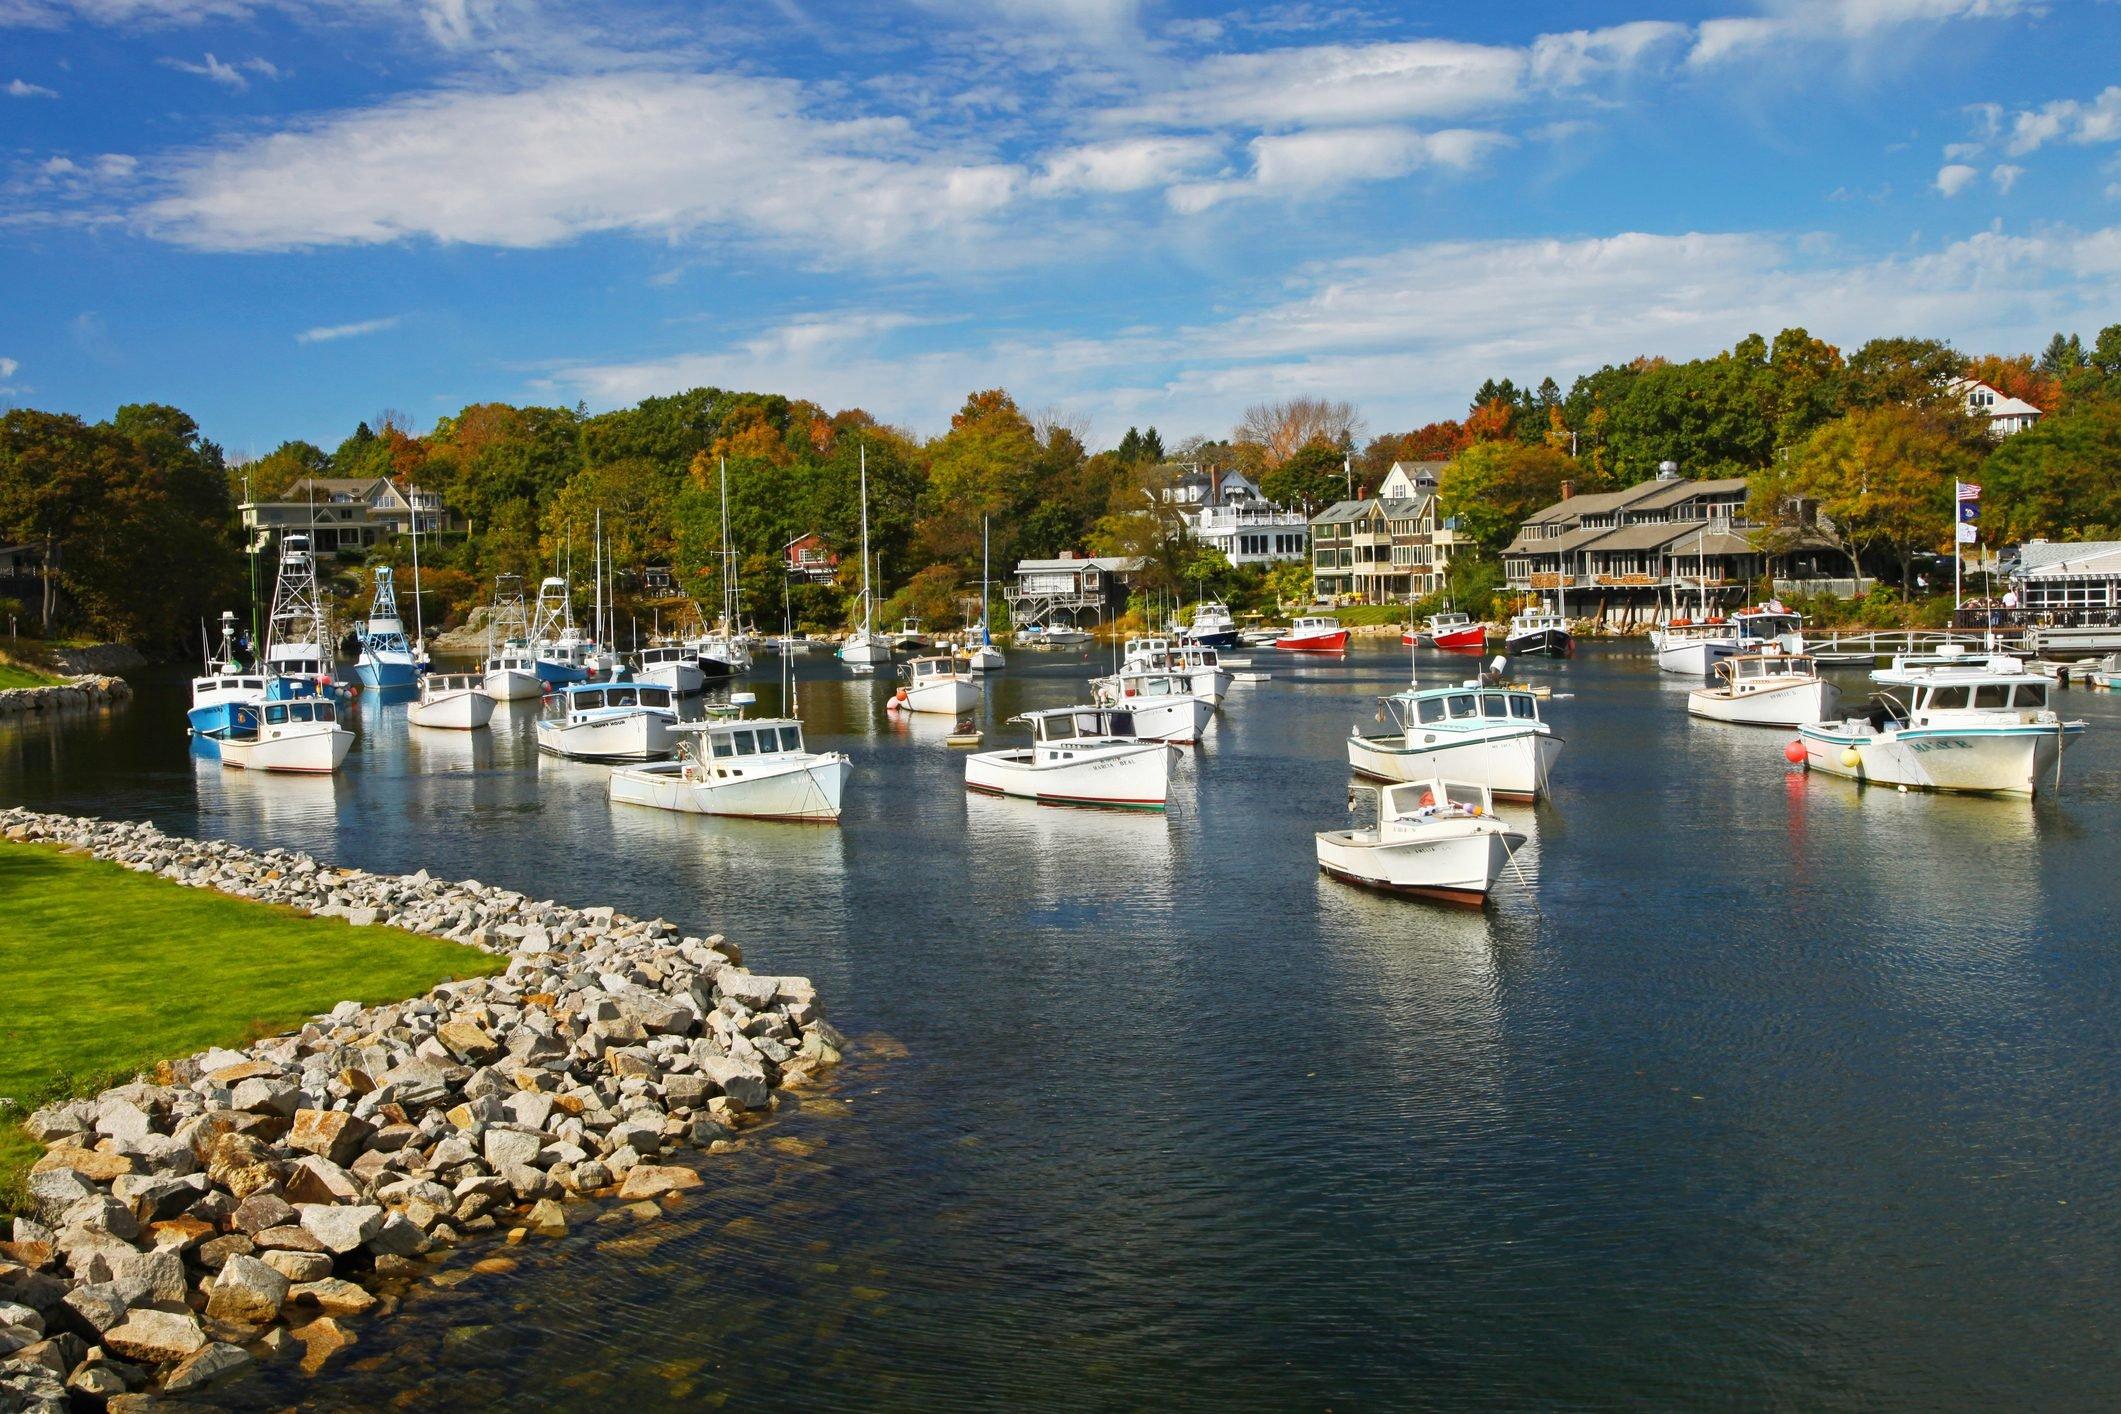 Boats in Perkins Cove, Ogunquit, Maine